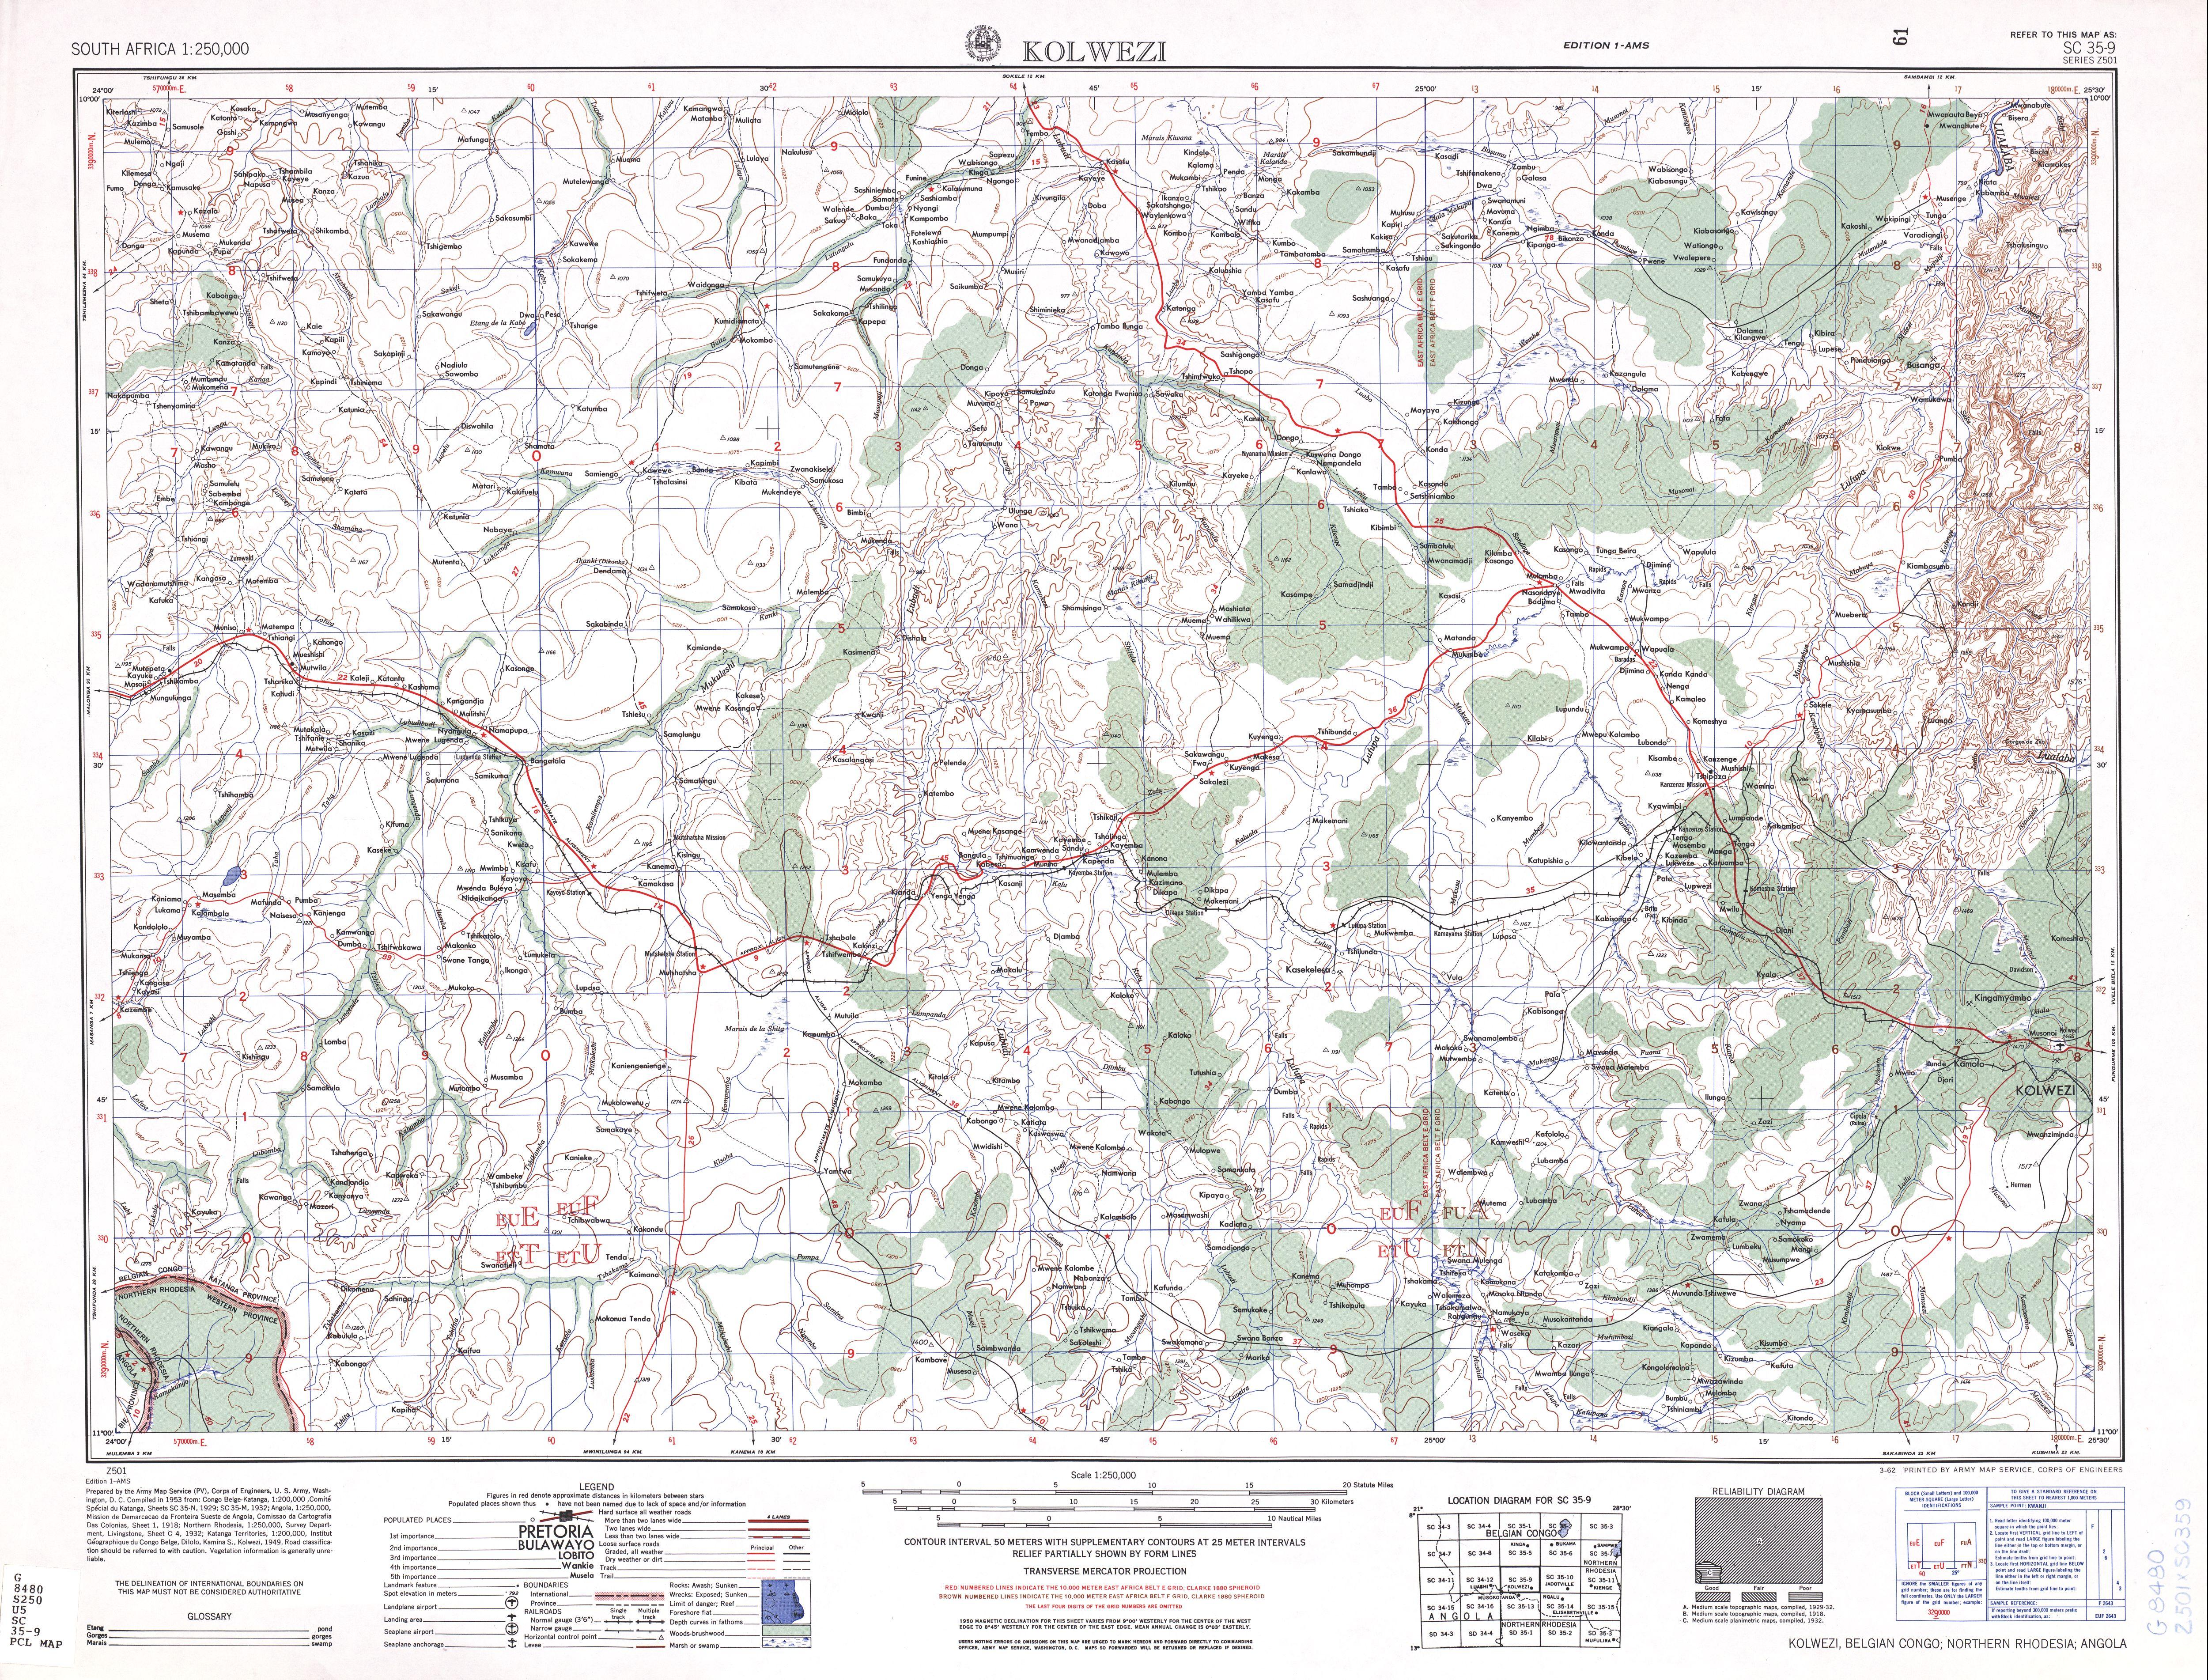 Hoja Kolwezi del Mapa Topográfico de África Meridional 1954